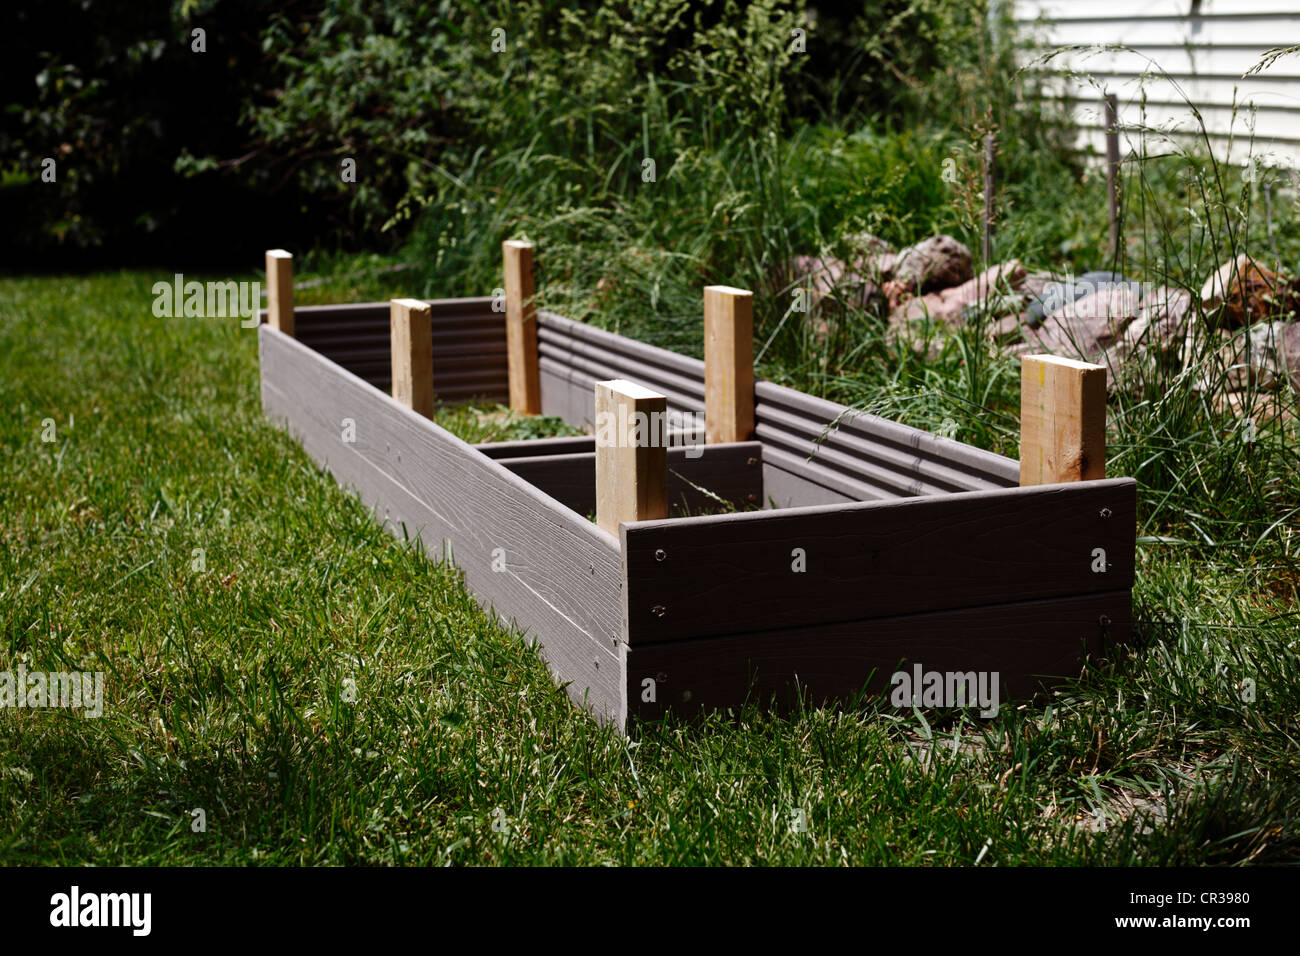 Homemade Composite Lumber Garden Planter Box, Upside Down, Displaying  Corner Stakes.